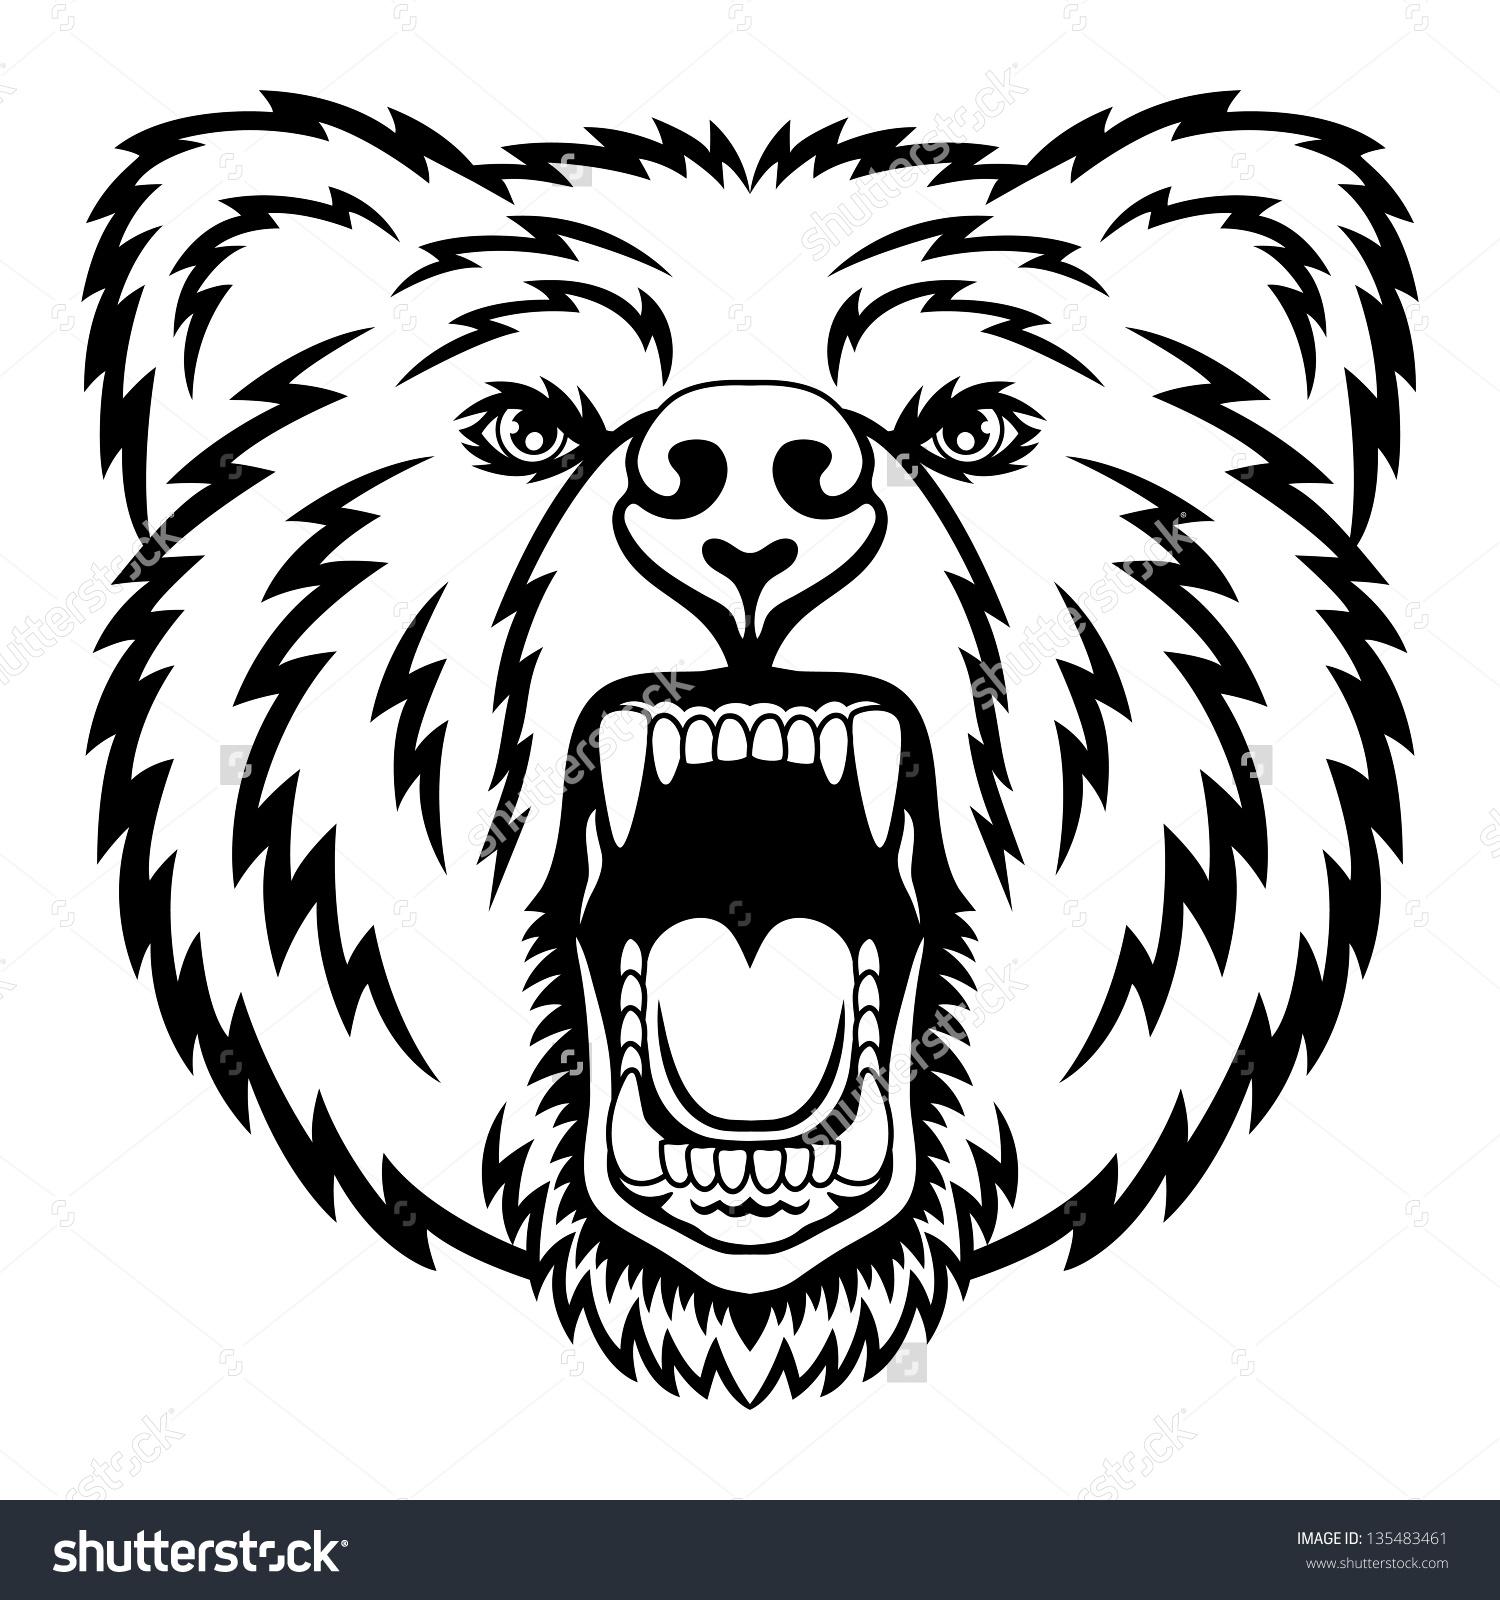 Bear Head Logo This Vector Illustration Stock Vector 135483461.